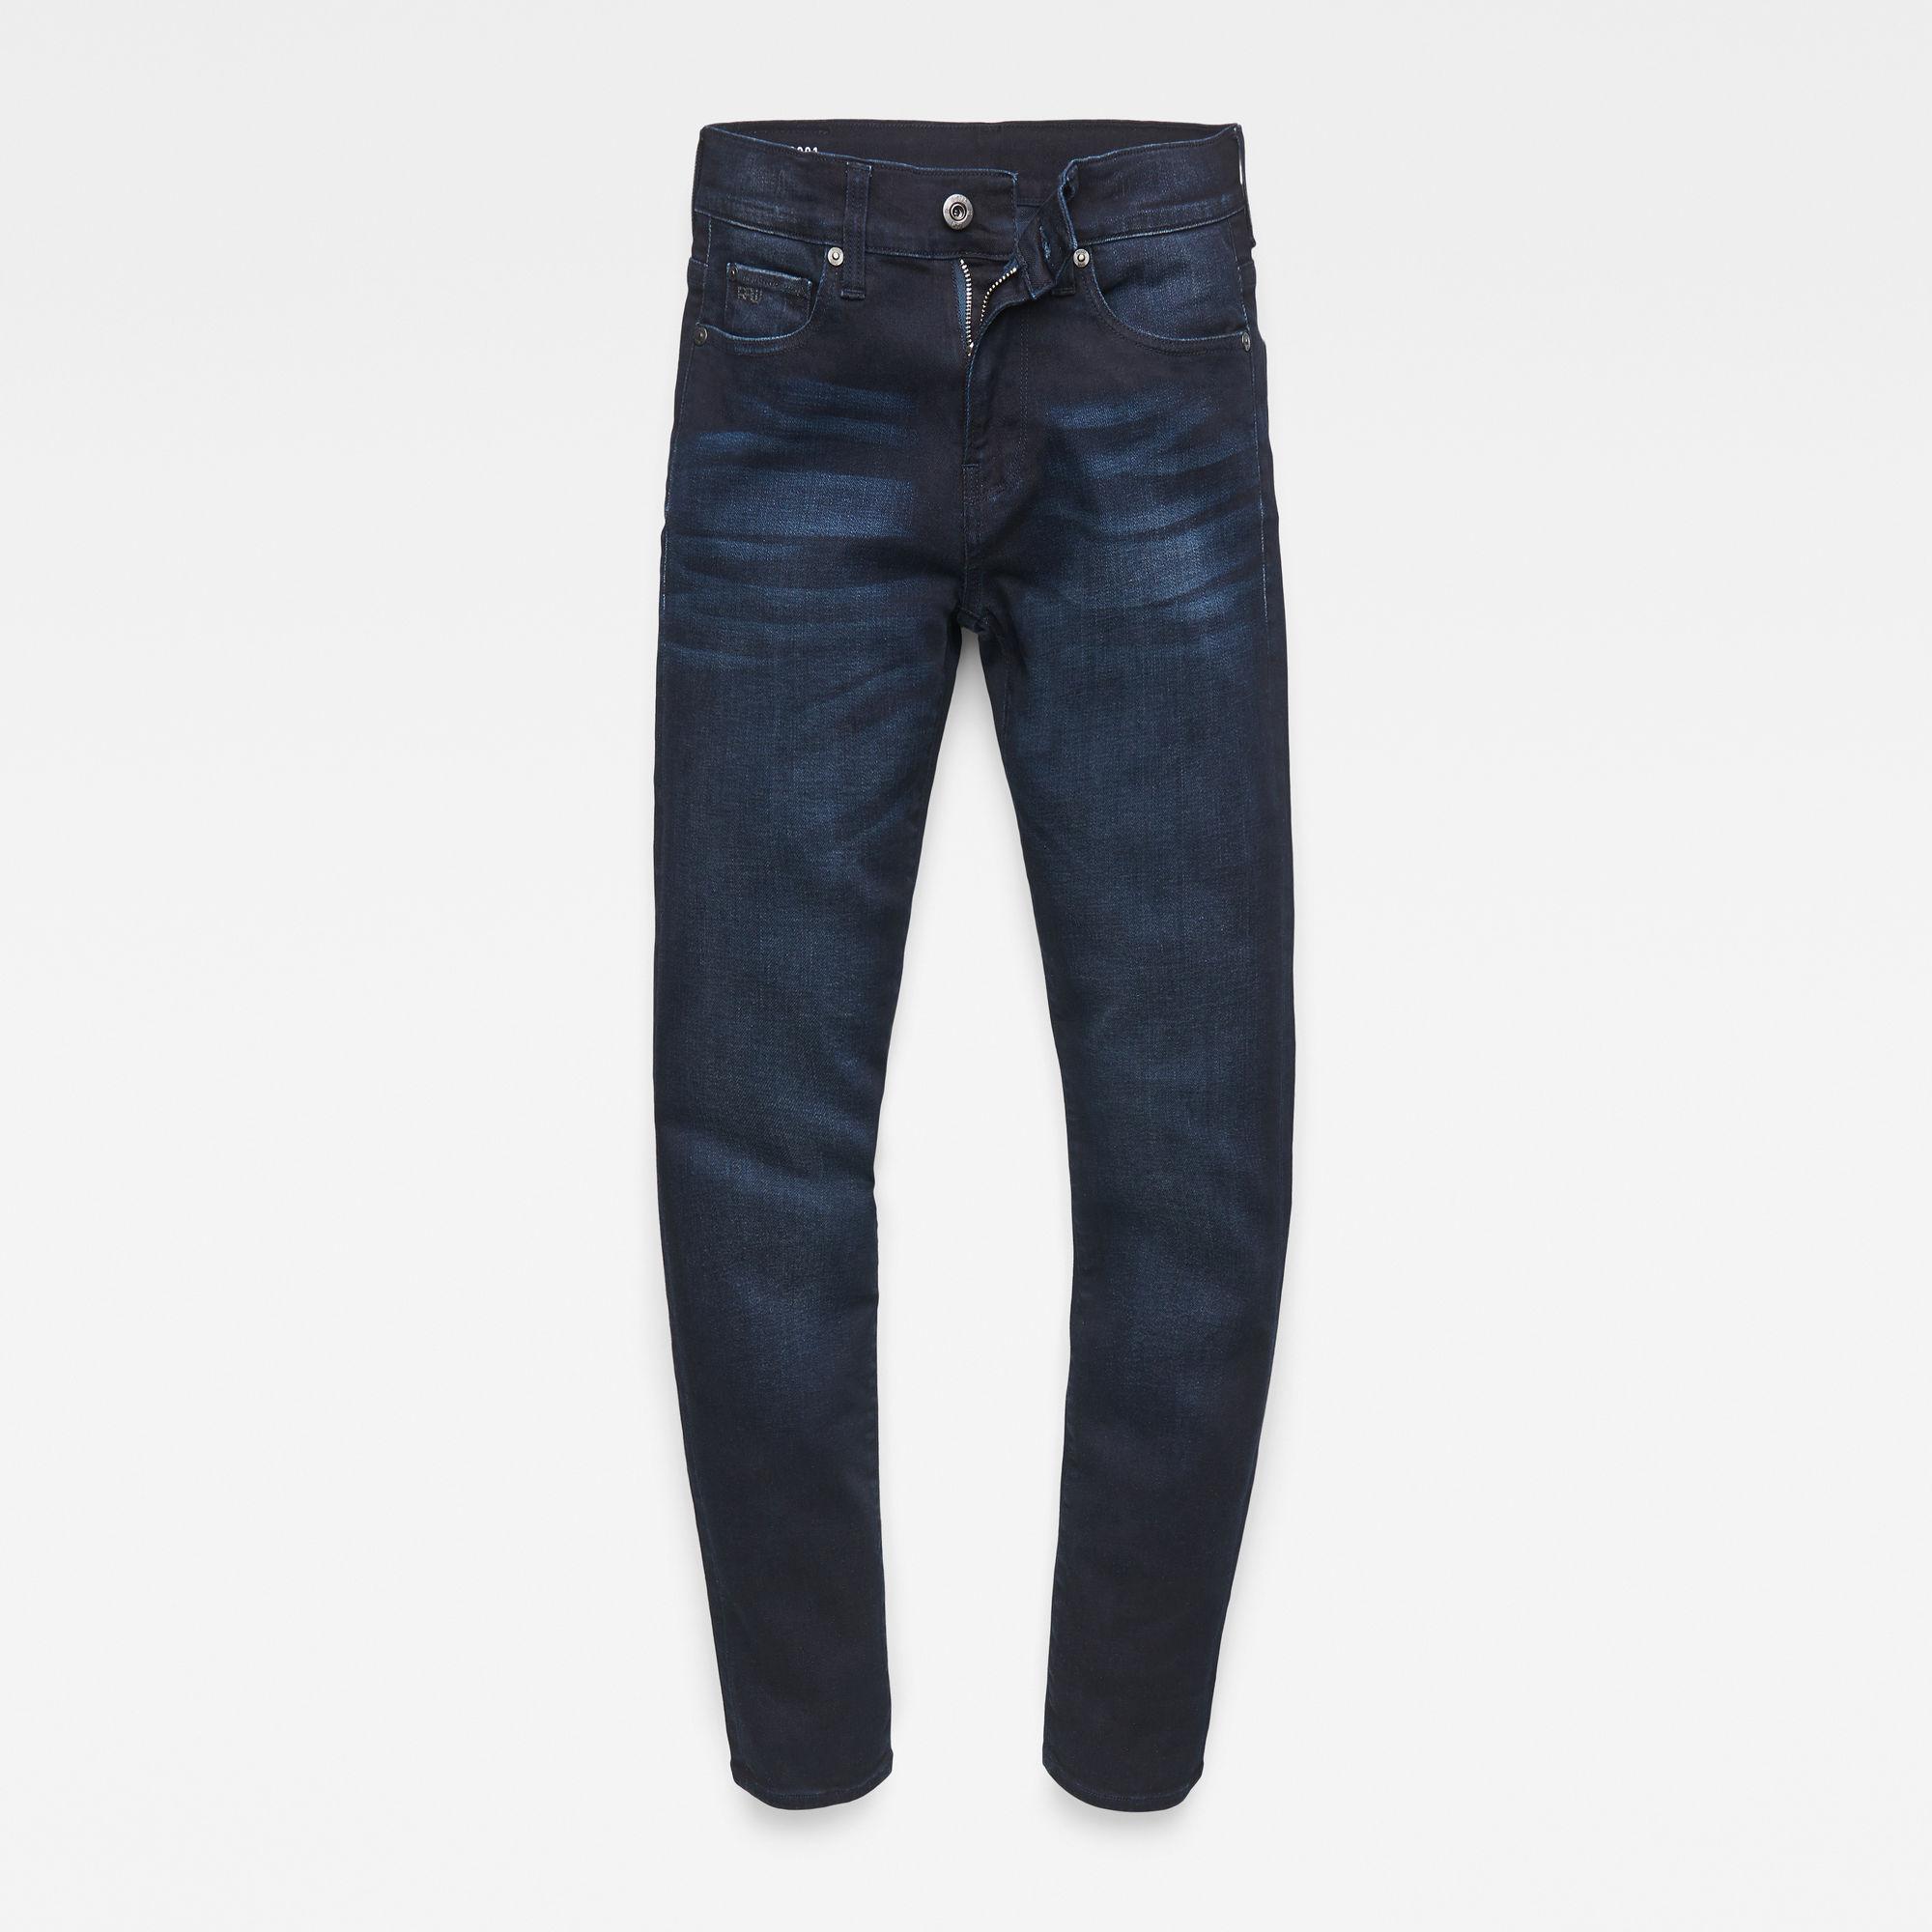 G-Star RAW Jongens 3301 Slim Jeans Donkerblauw